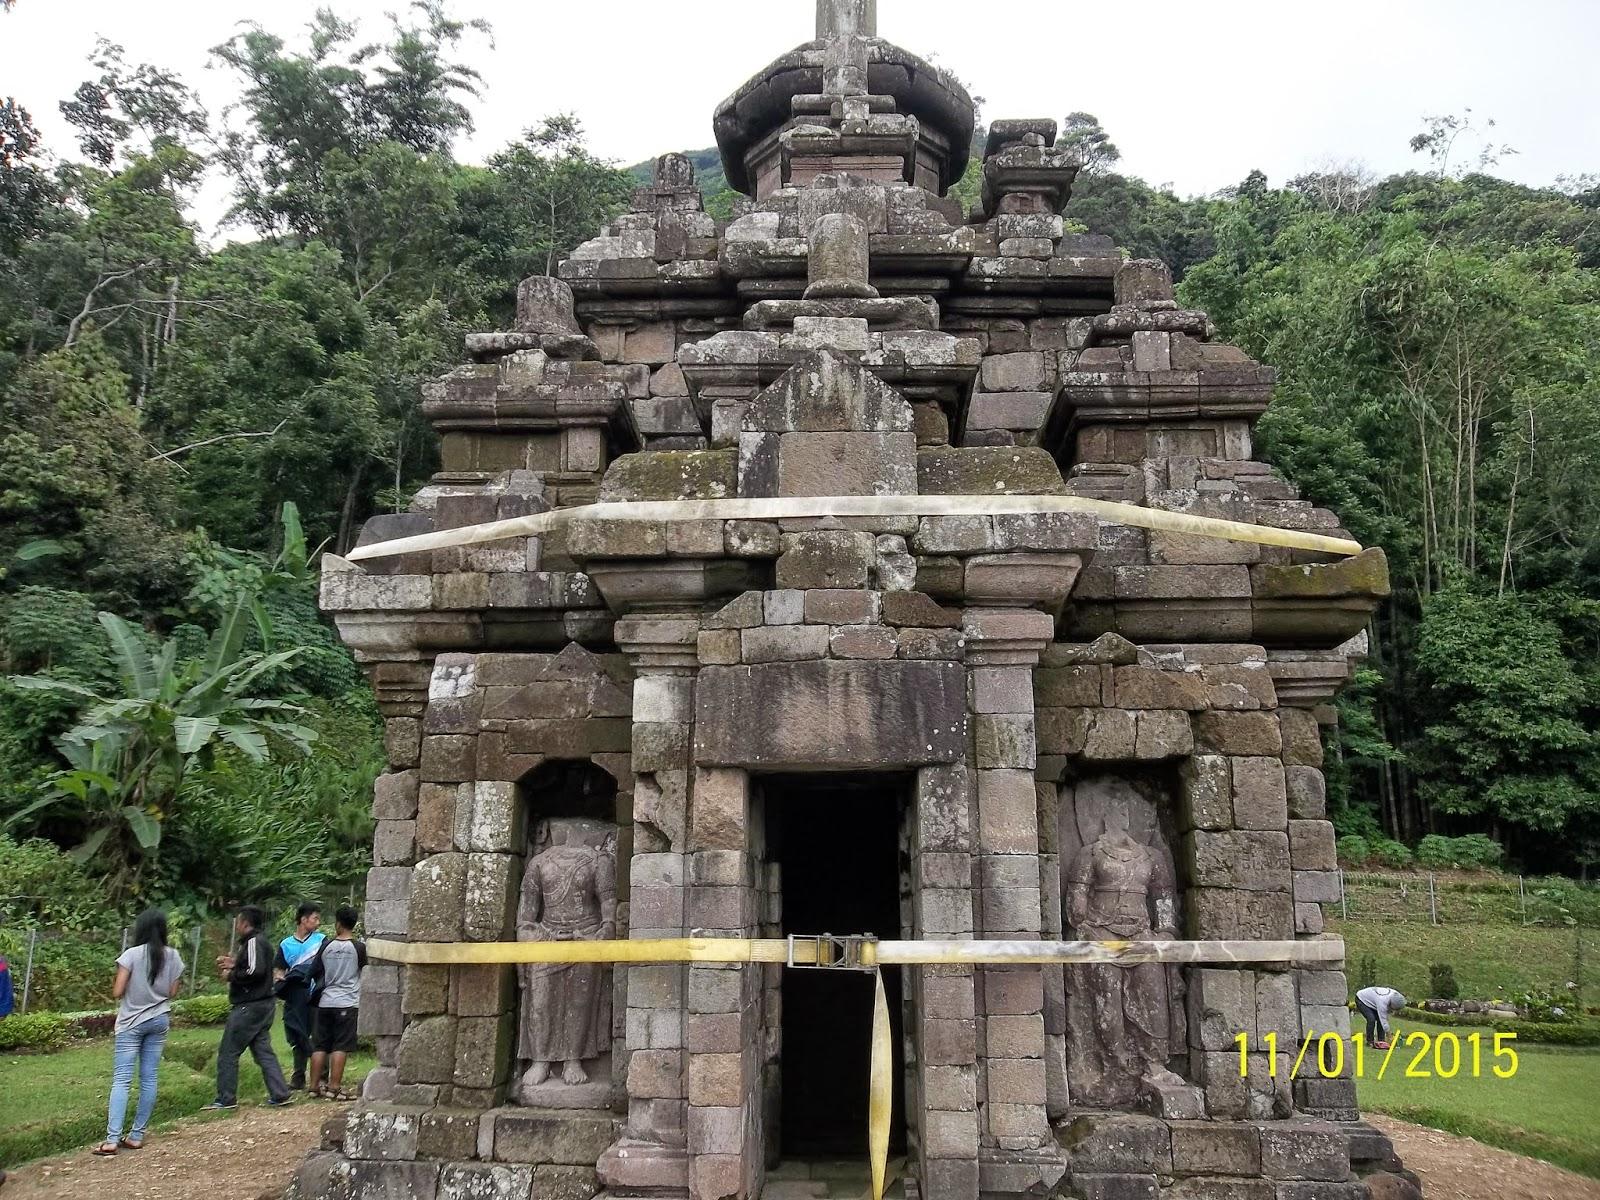 Blusukan Situs Candi Selogriyo Lokasi Selogrio Kab Magelang